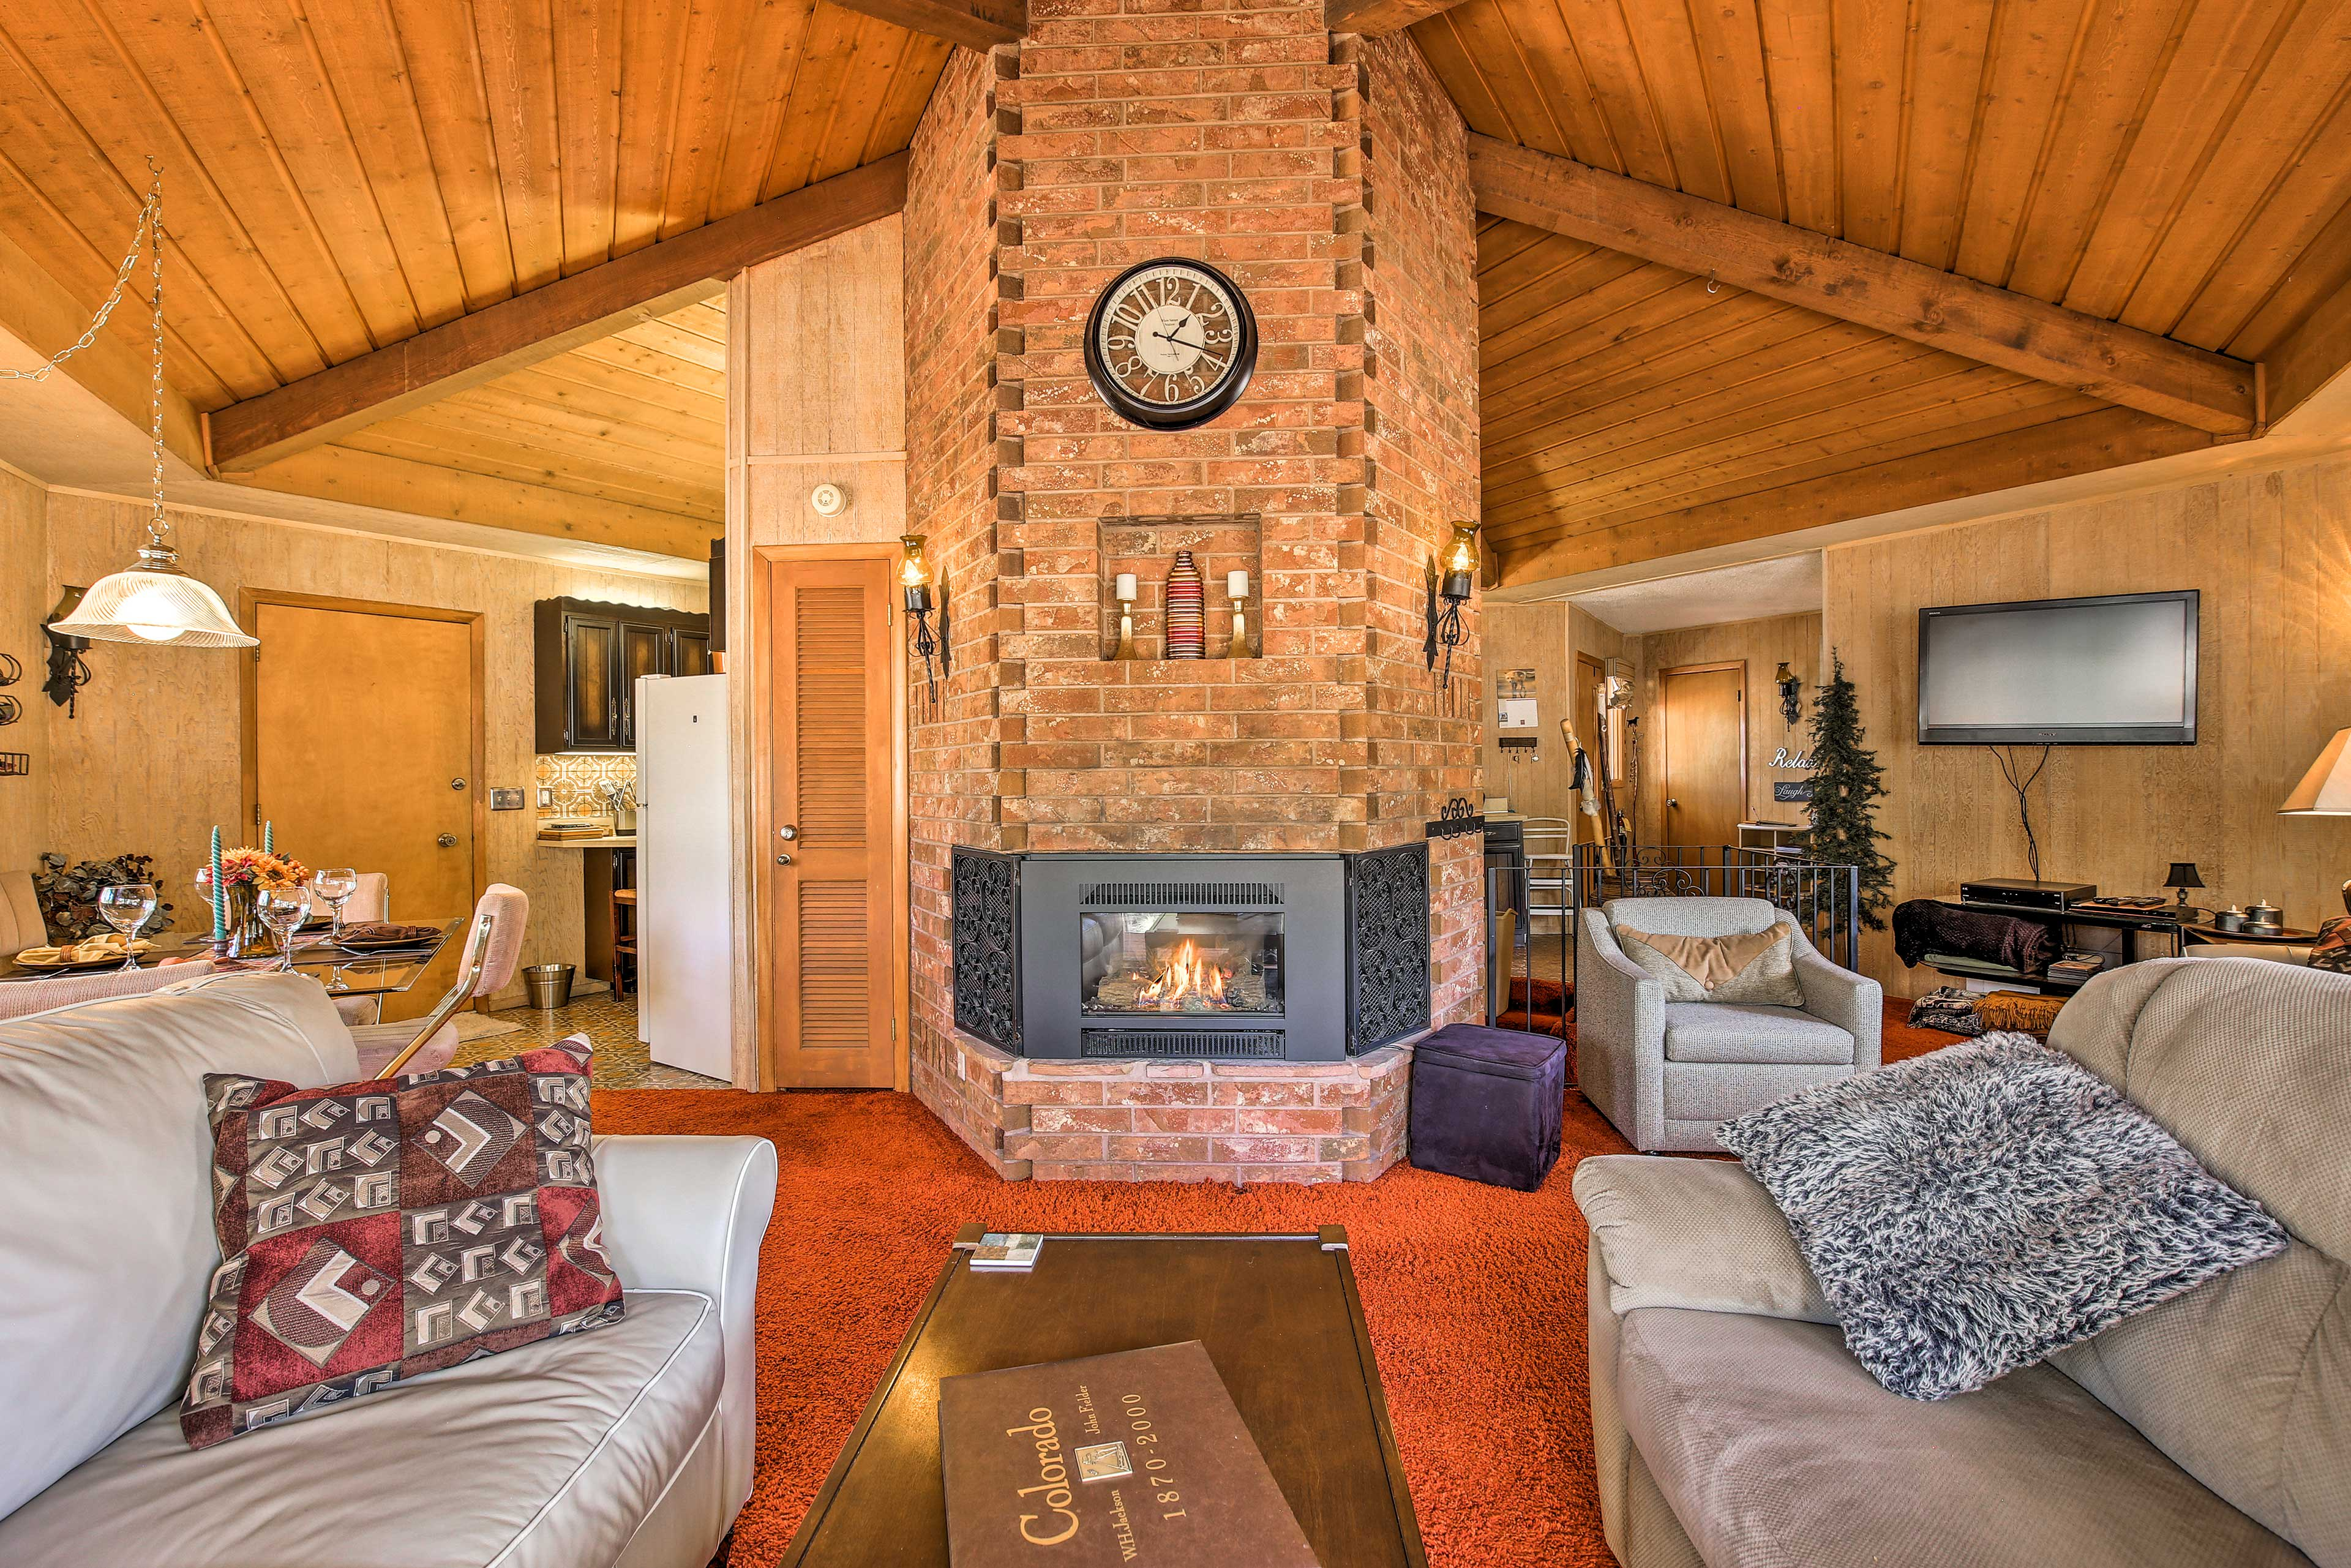 Buena Vista Vacation Rental | 2-Story Home | 2BR | 3BA | 1,500 Sq Ft